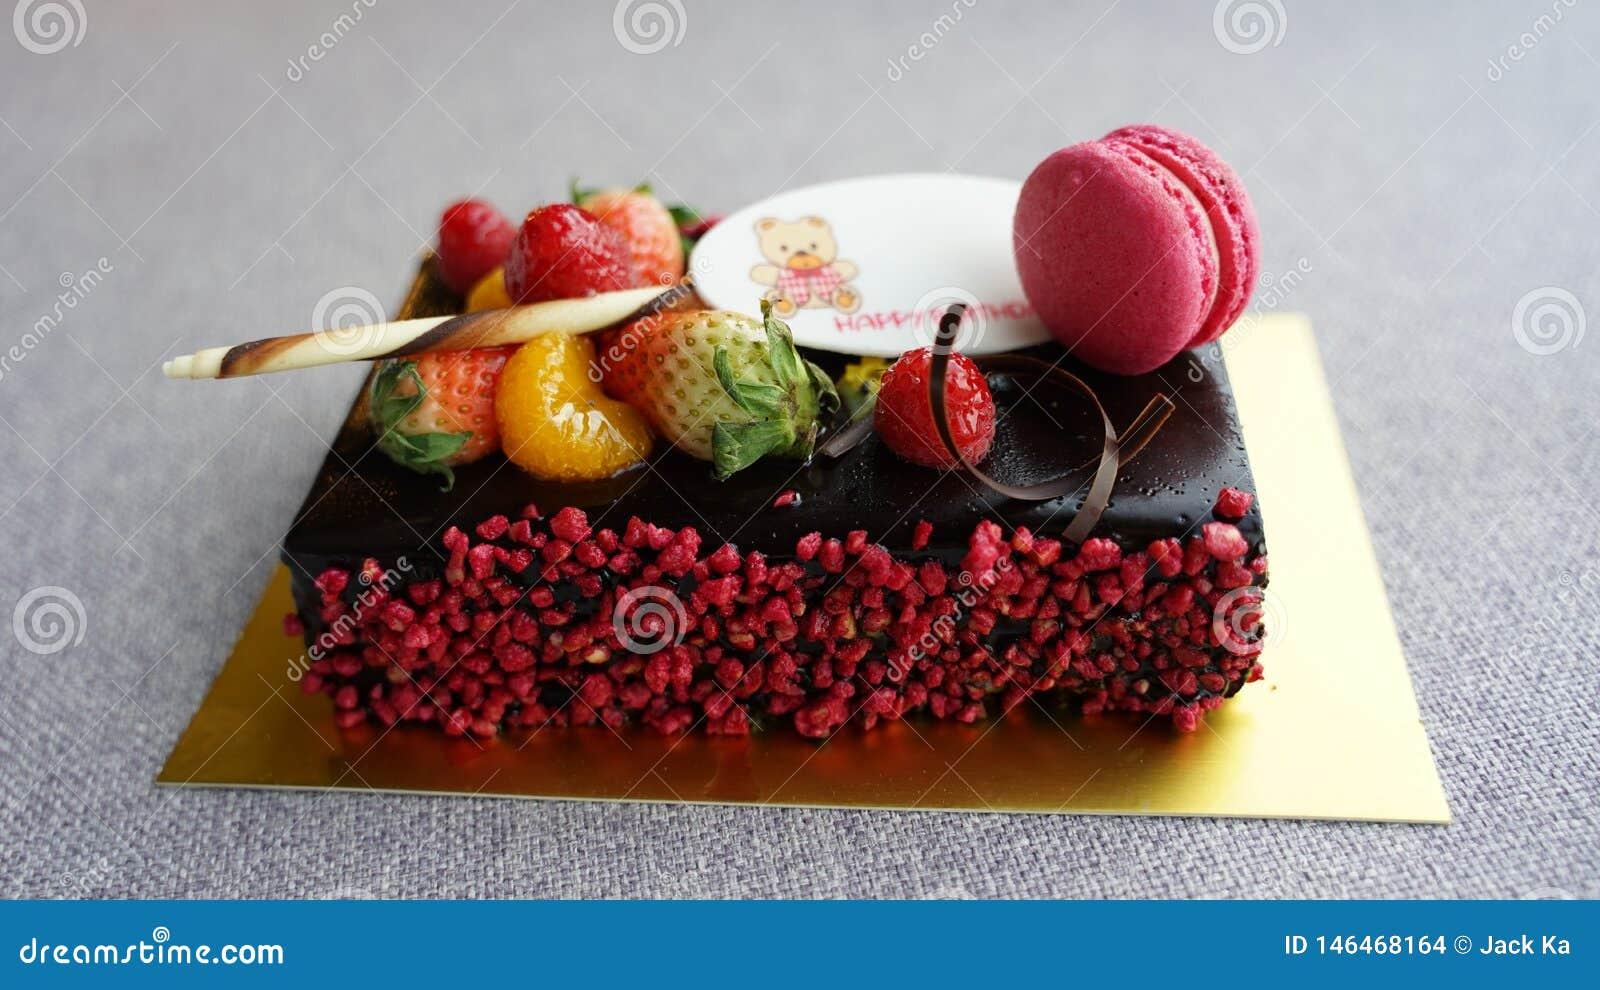 Pleasant Chocolate Birthday Cake With Macaron Stock Photo Image Of Mode Funny Birthday Cards Online Alyptdamsfinfo